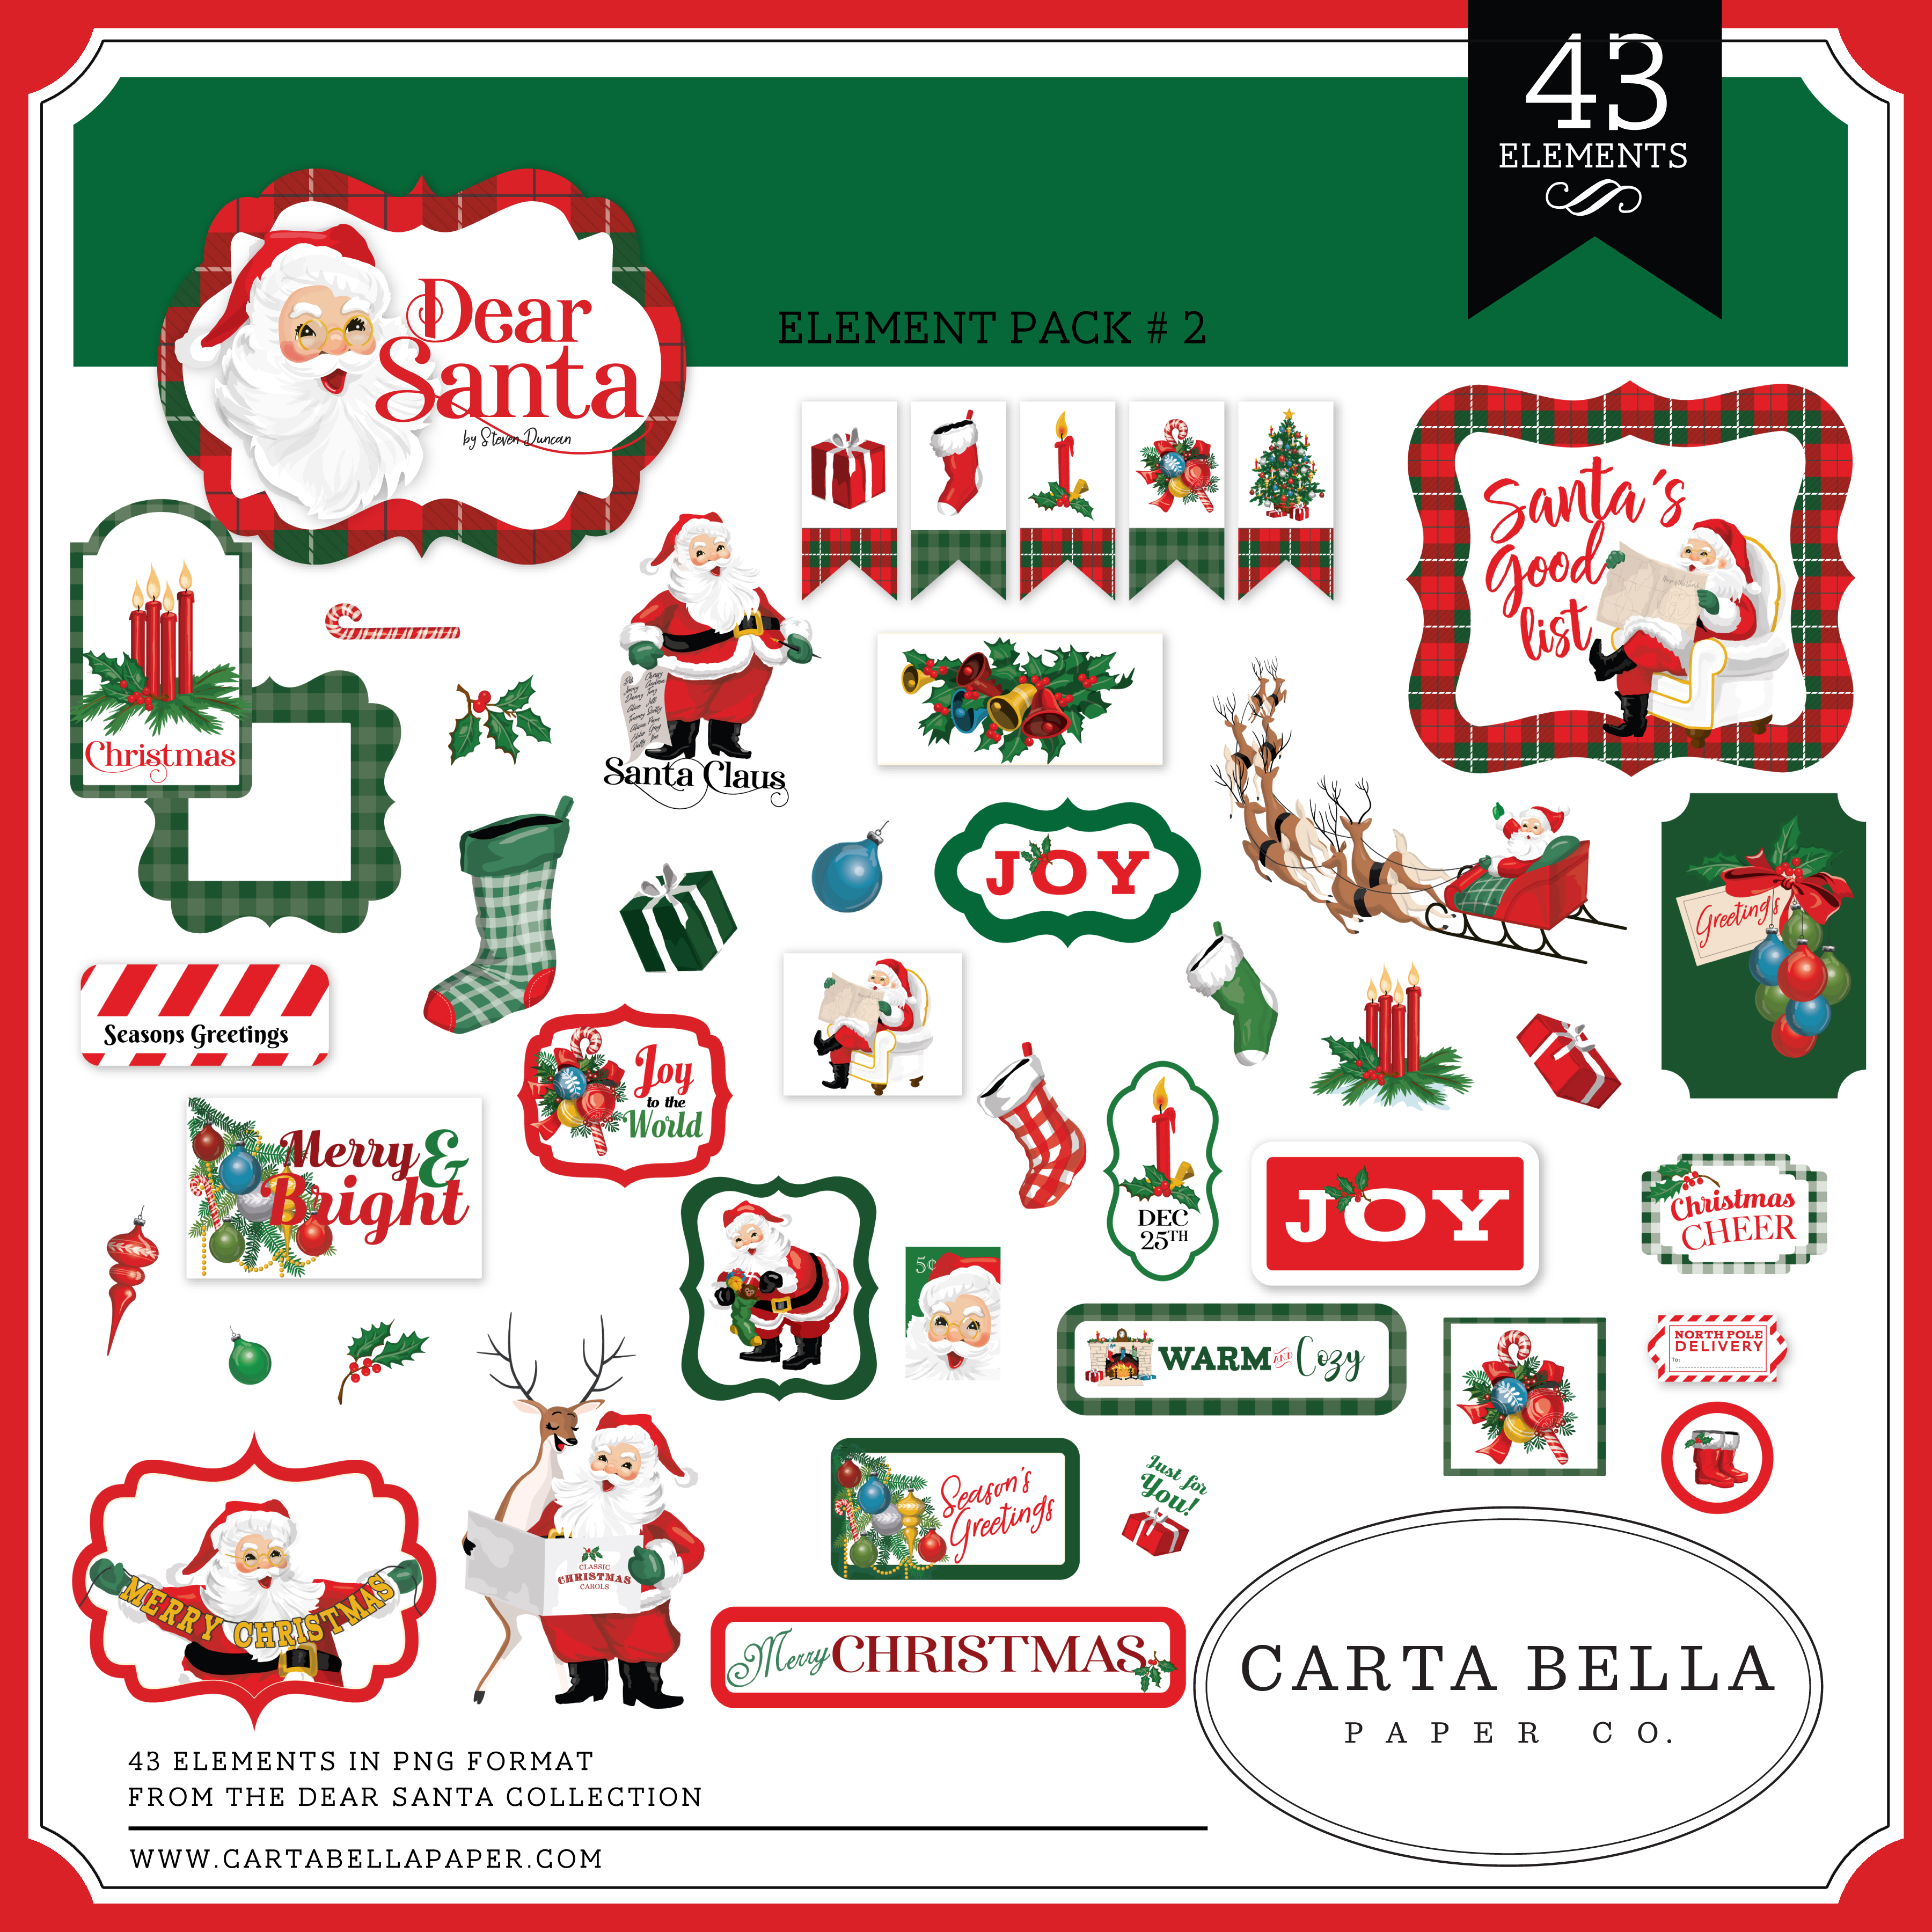 Dear Santa Element Pack #2